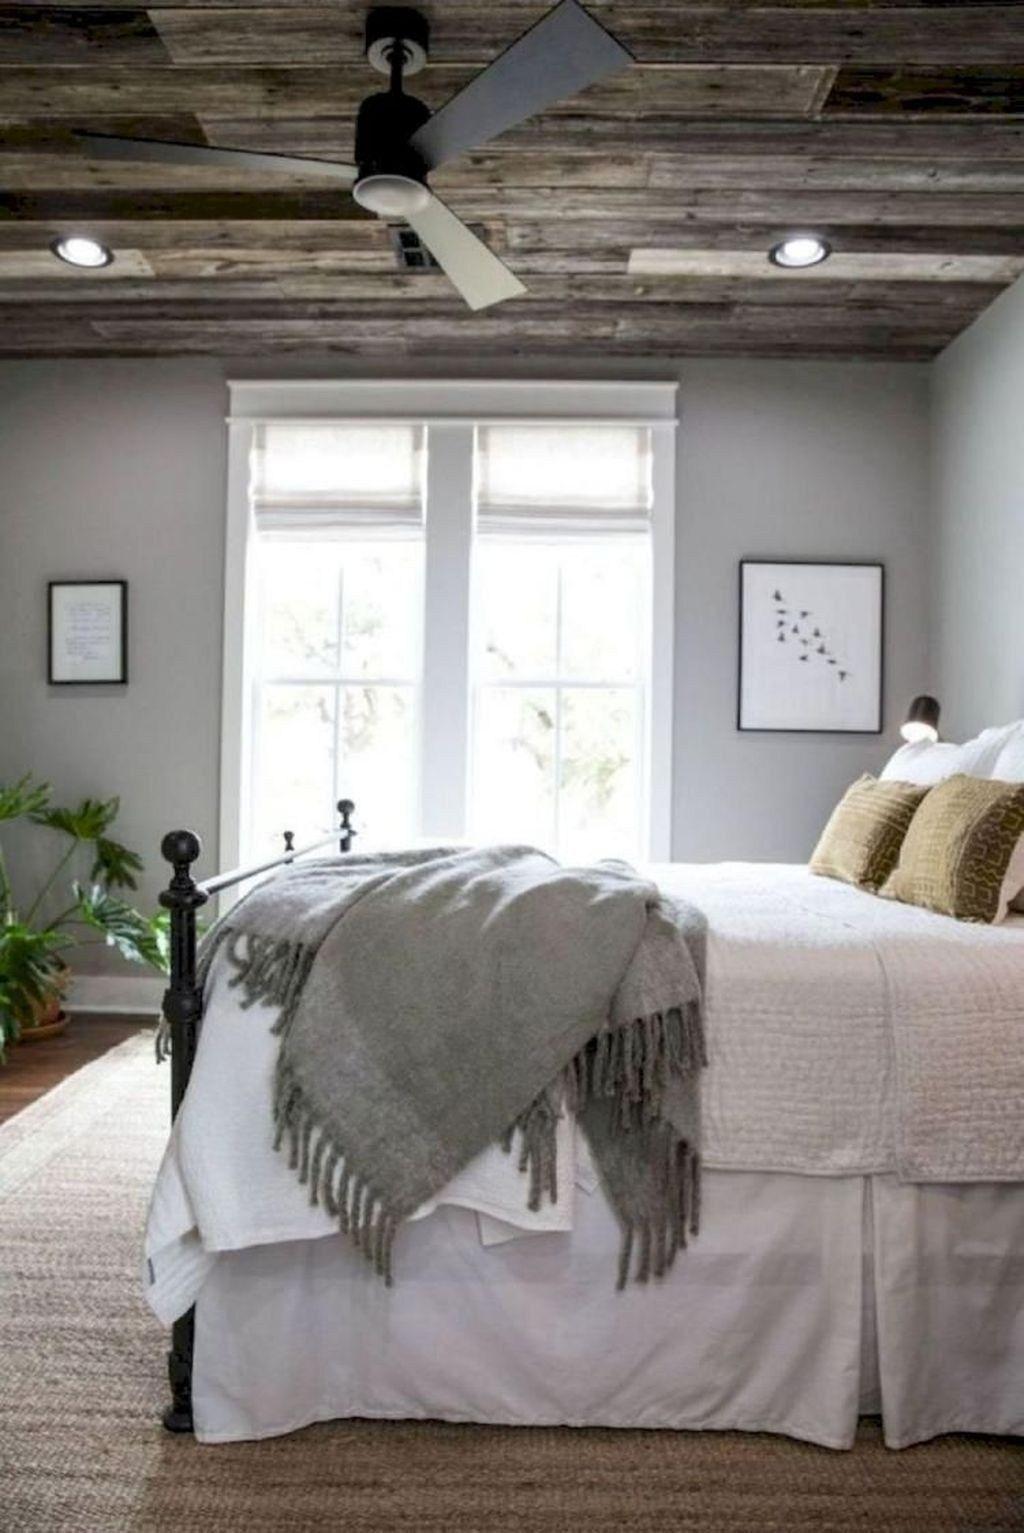 Smart Bedroom Decor Ideas With Farmhouse Style39